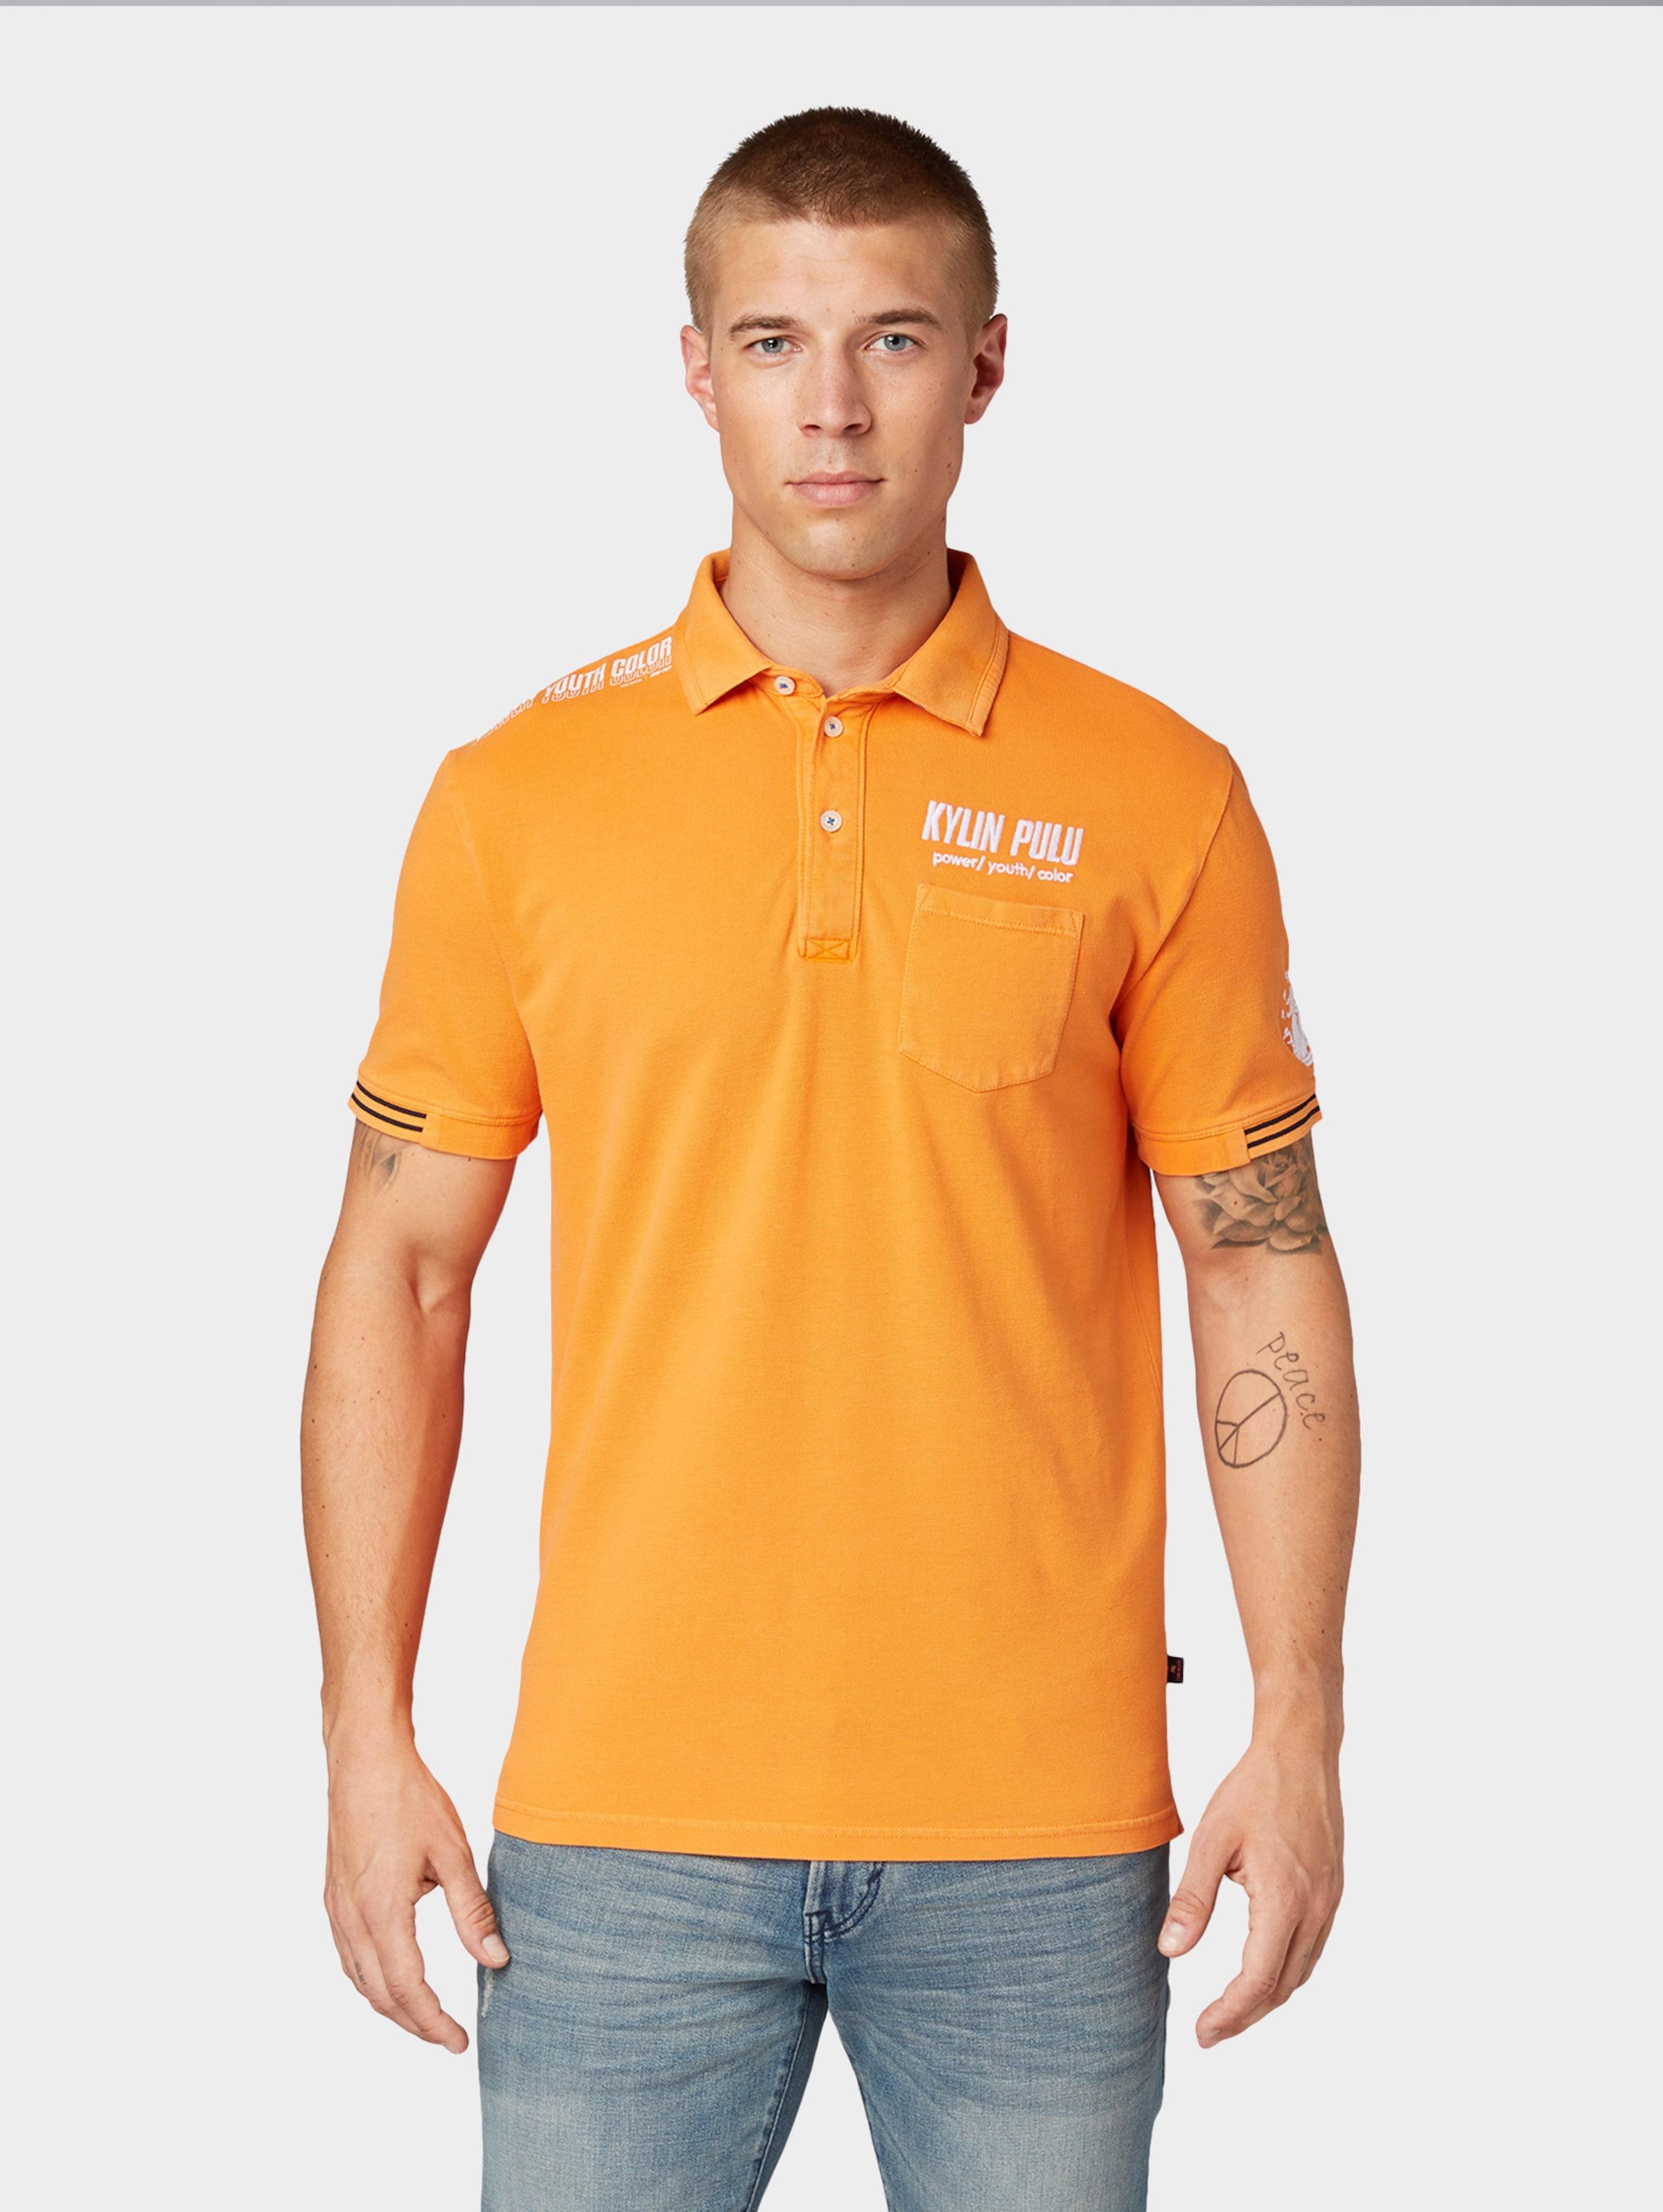 Tailor HellorangeWeiß Poloshirt In Tom 'kylin' 45RLA3j